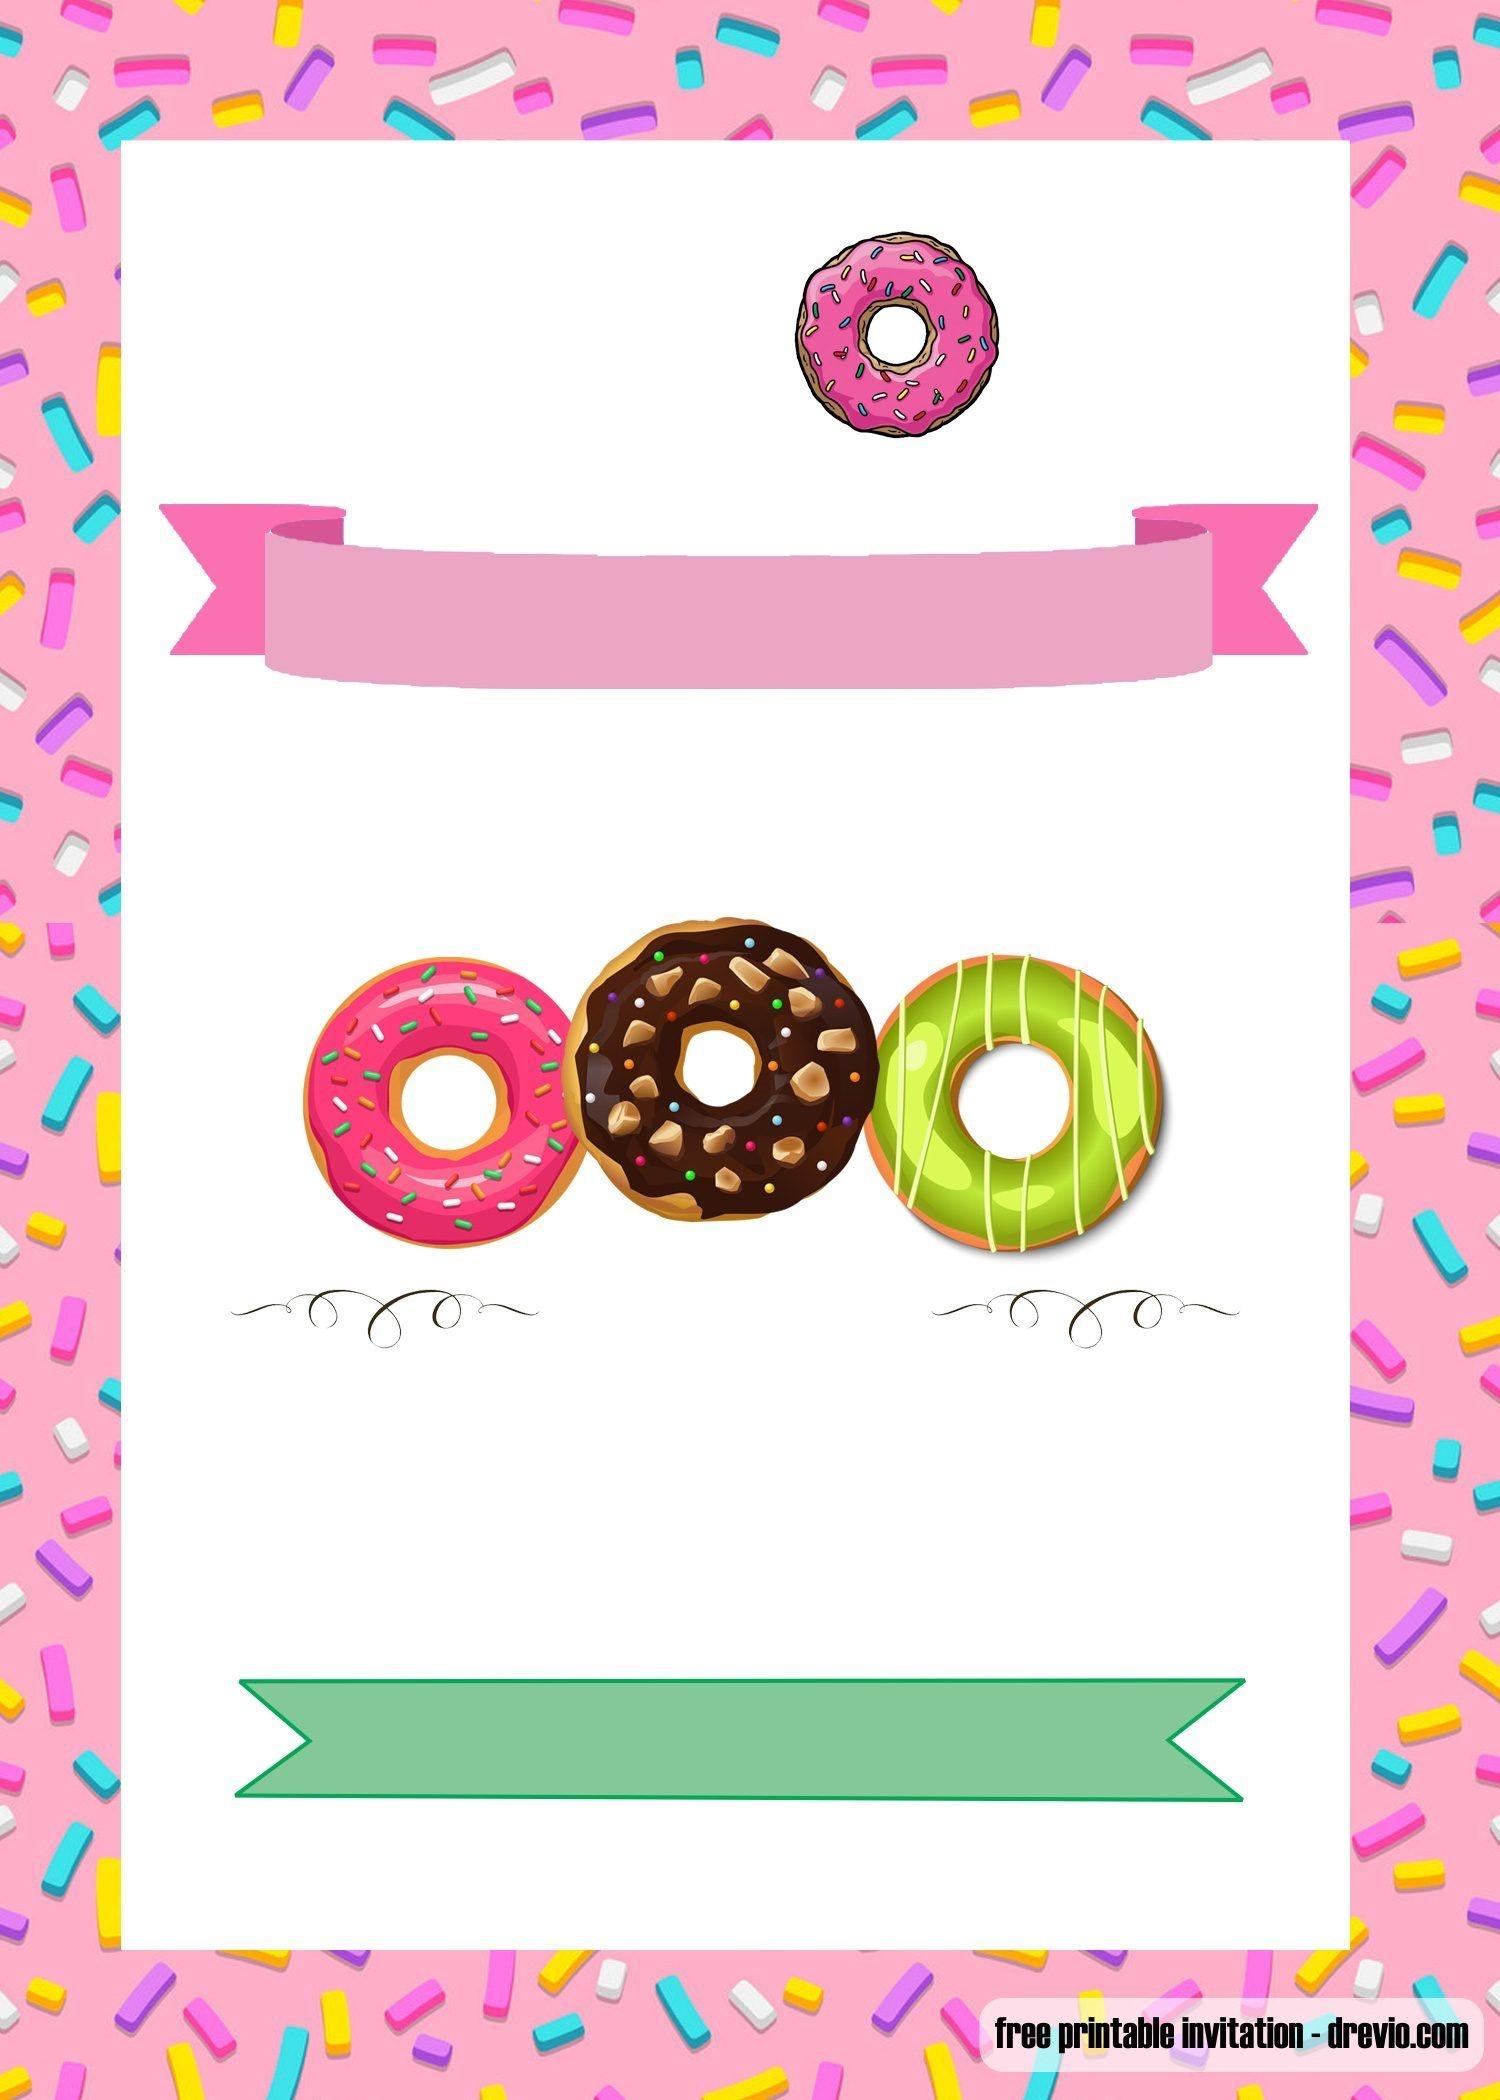 Free Printable Donuts Invitation | Free Printable Birthday - Printable Invitations Free No Download